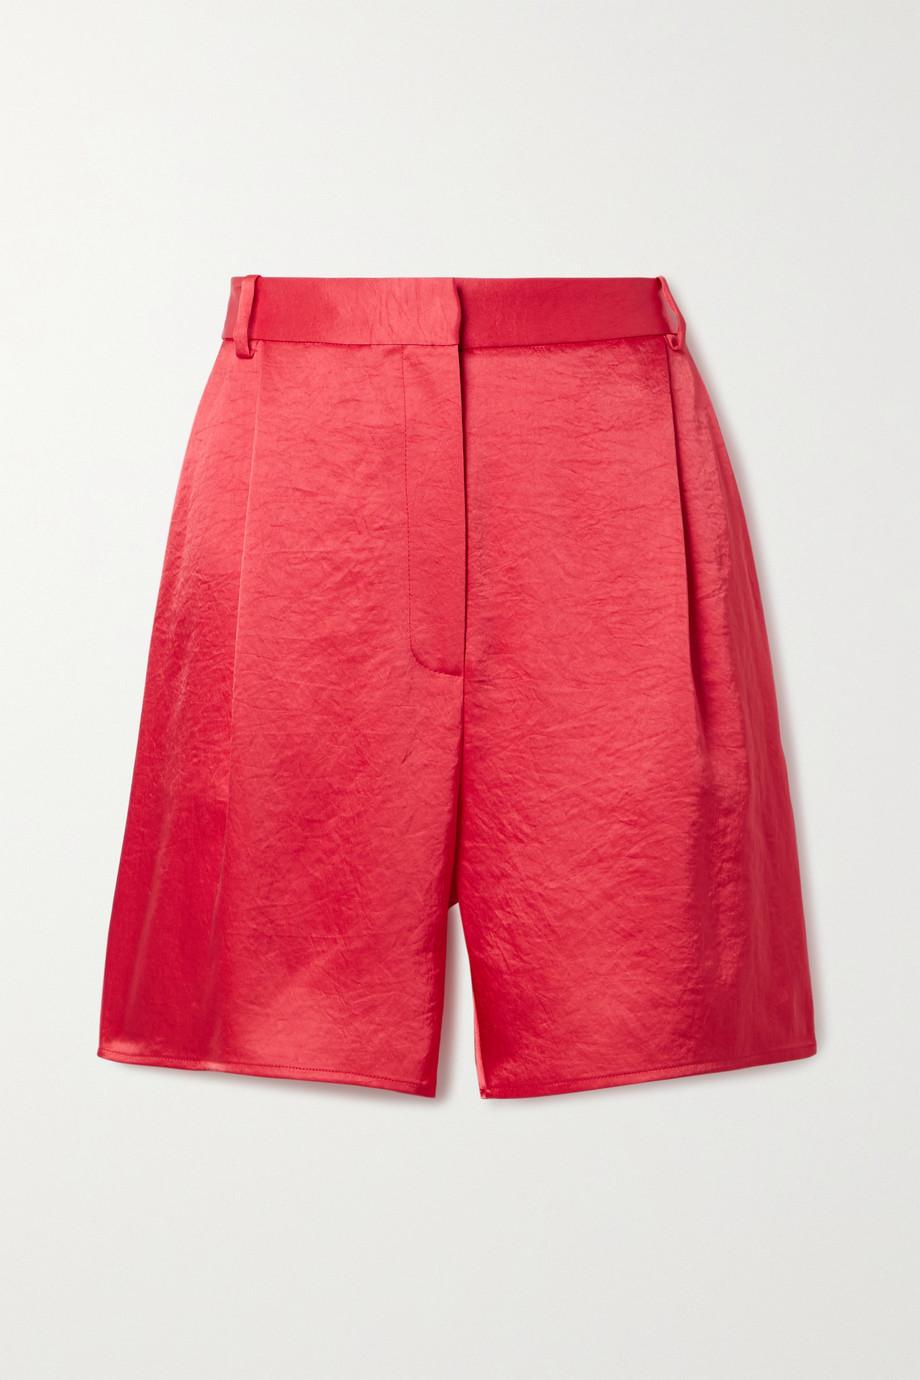 LAPOINTE Shorts aus Satin in Knitteroptik mit Falten